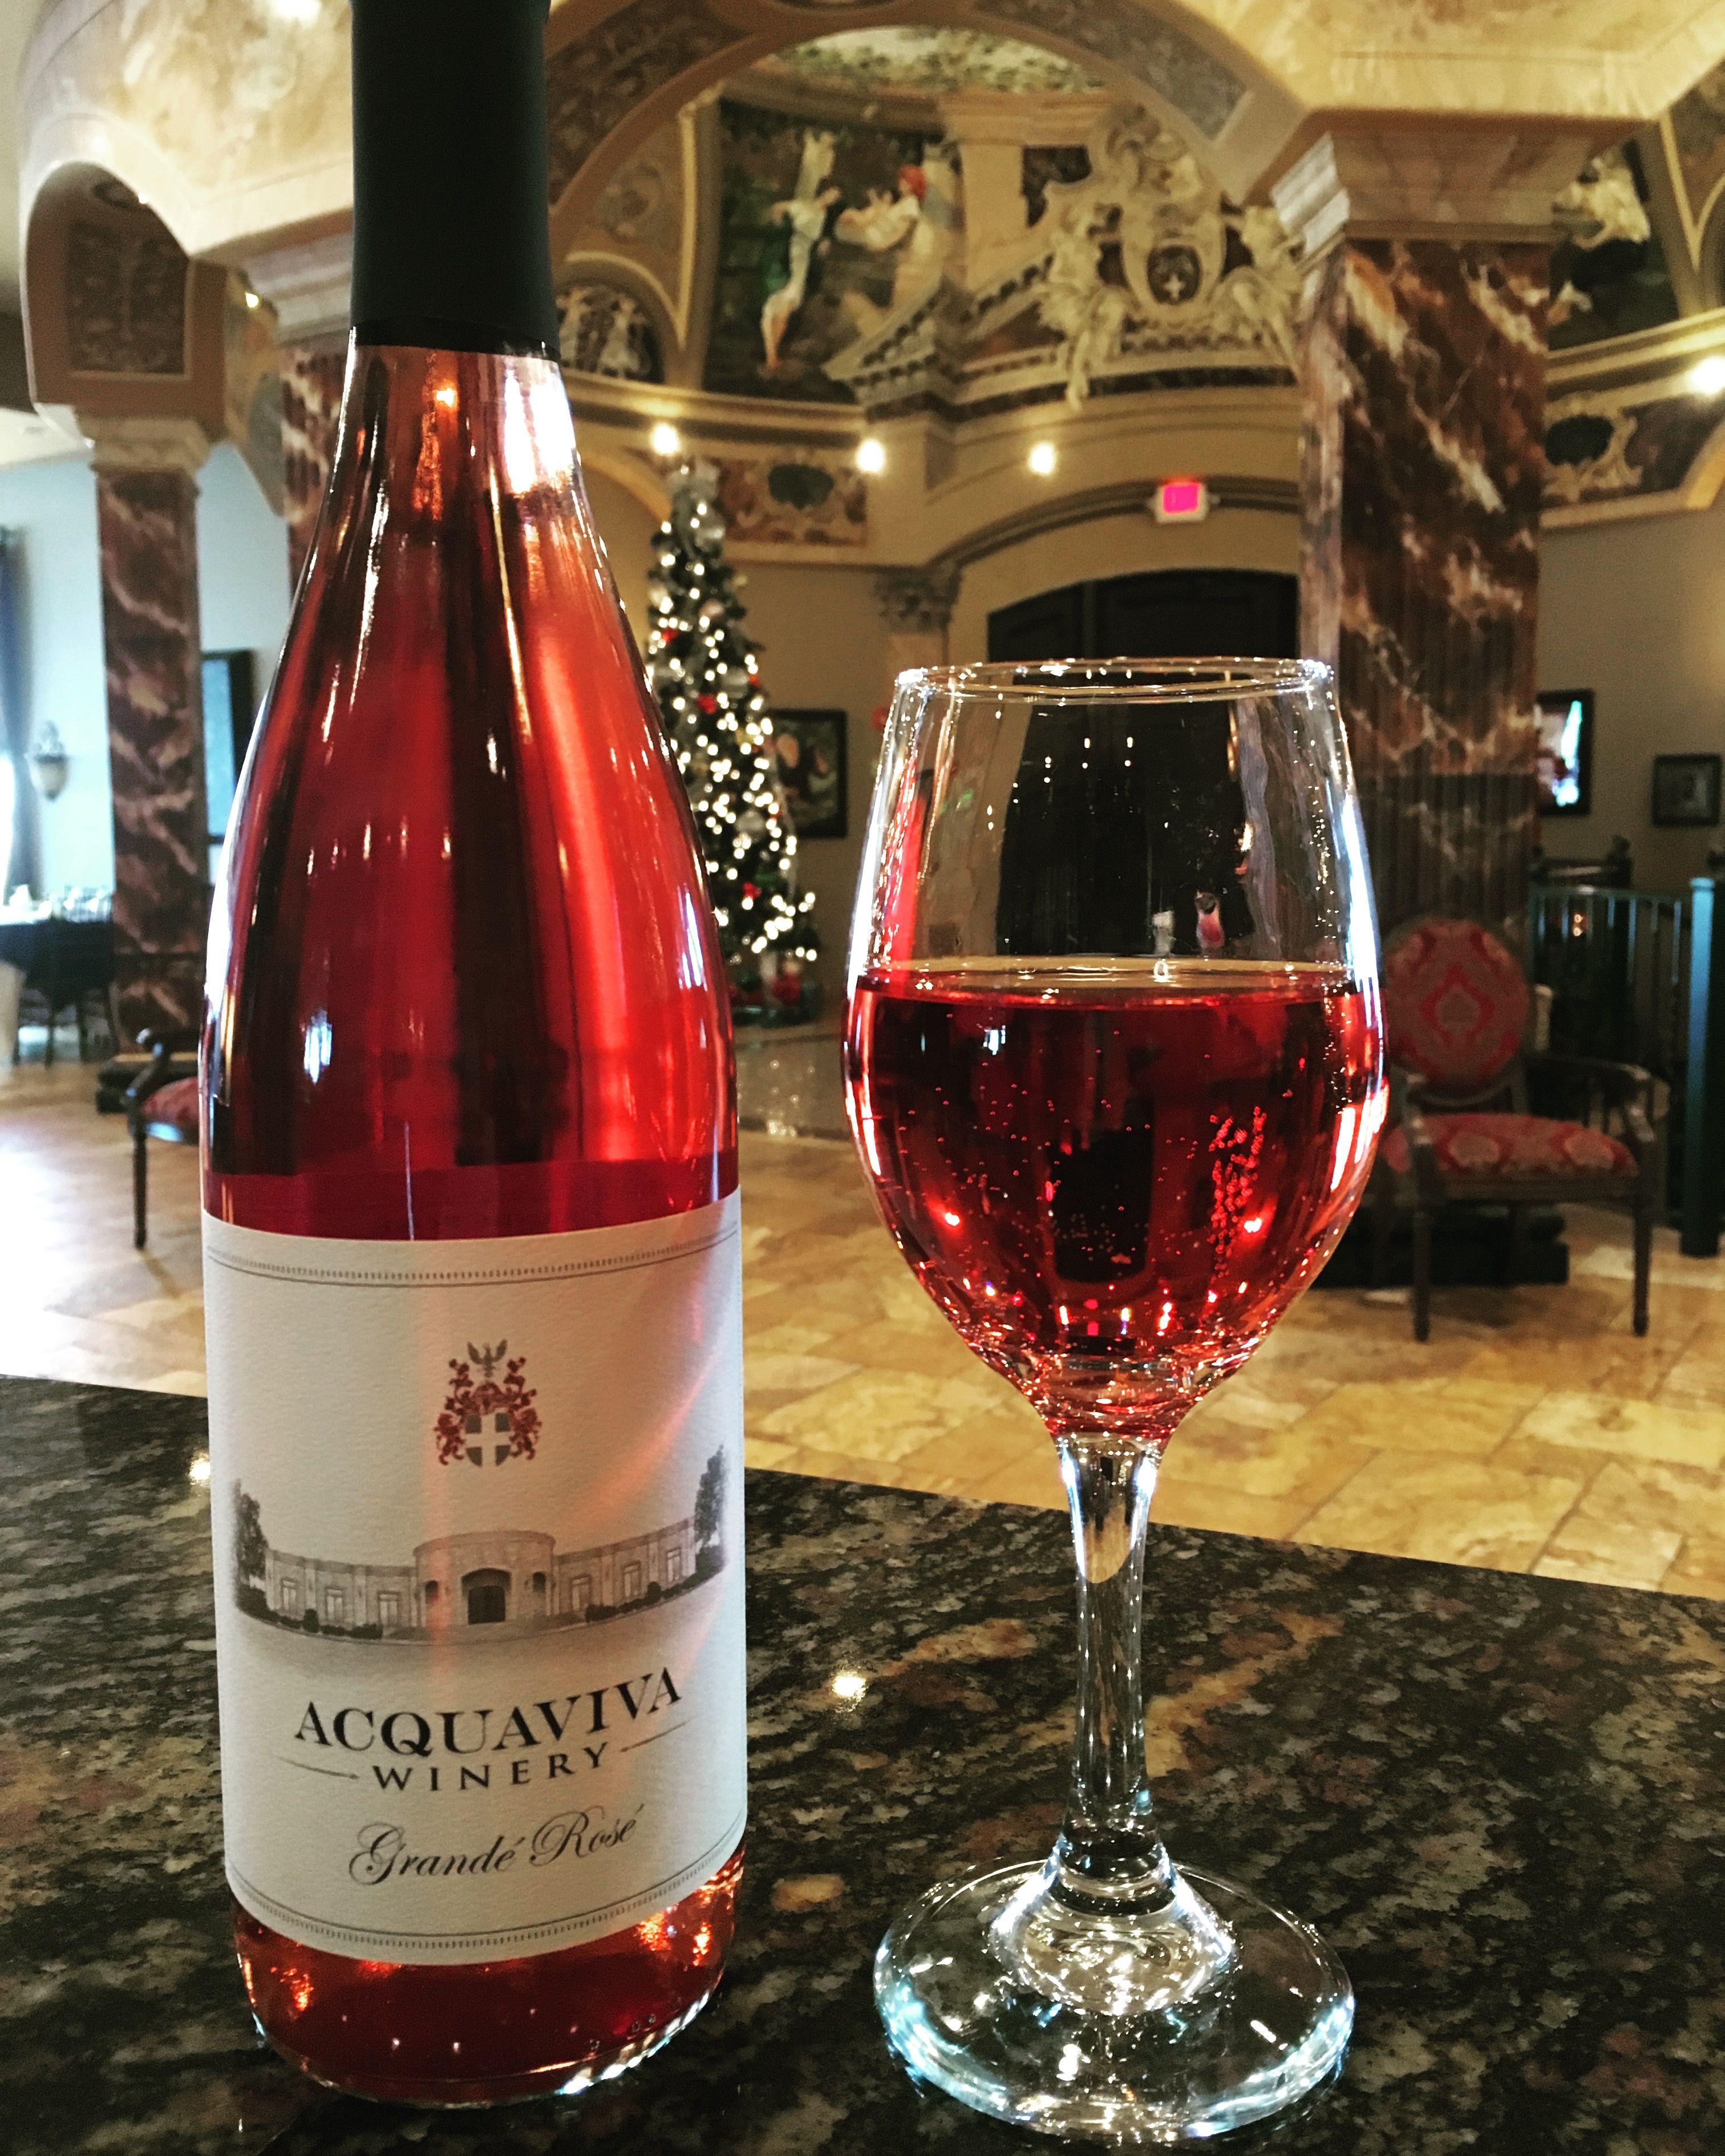 Pin By Acquaviva Winery On Wines Wine Bottle Wines Rose Wine Bottle